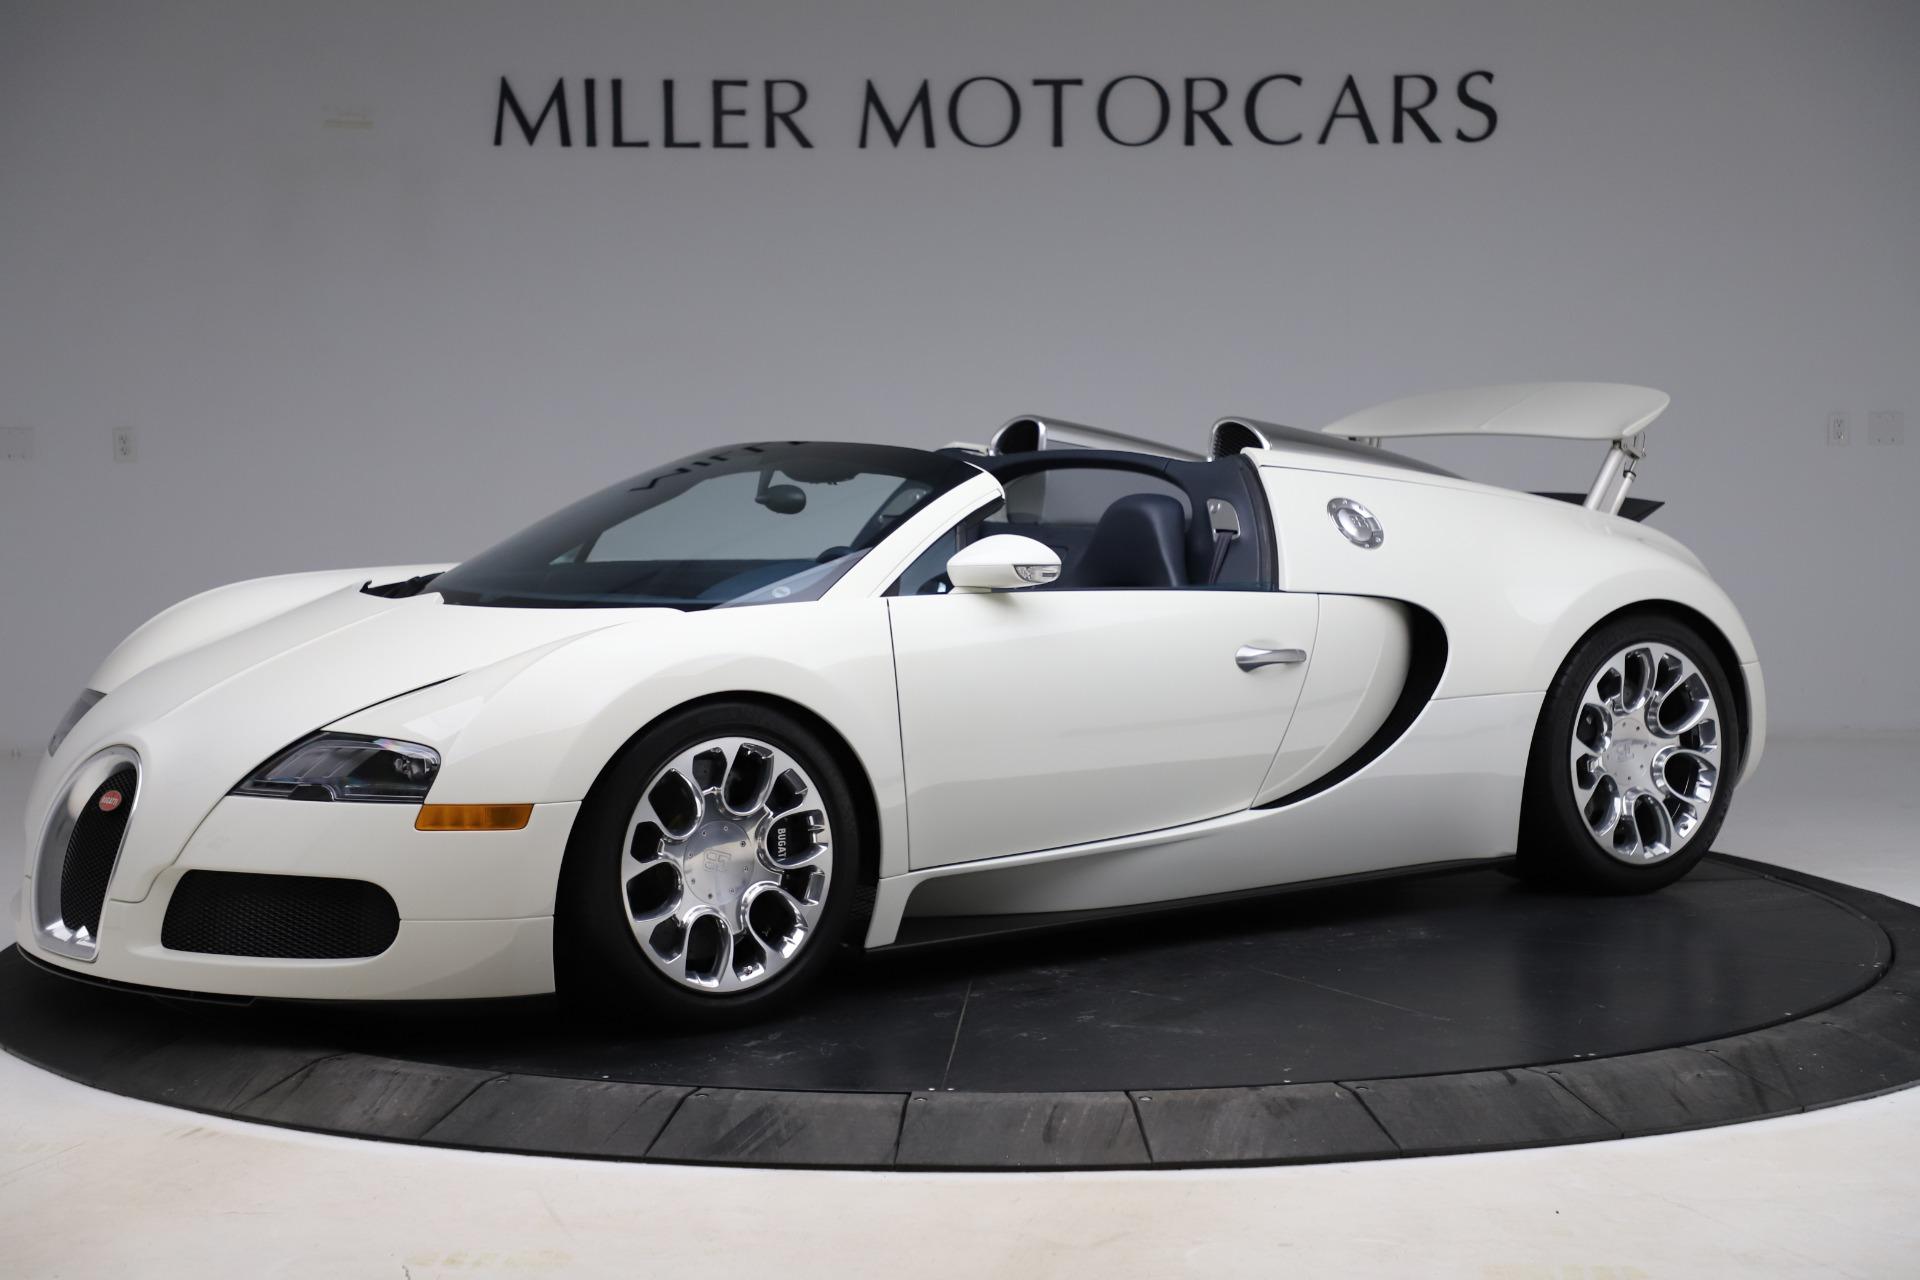 Used 2010 Bugatti Veyron 16.4 Grand Sport for sale Call for price at Bugatti of Greenwich in Greenwich CT 06830 1